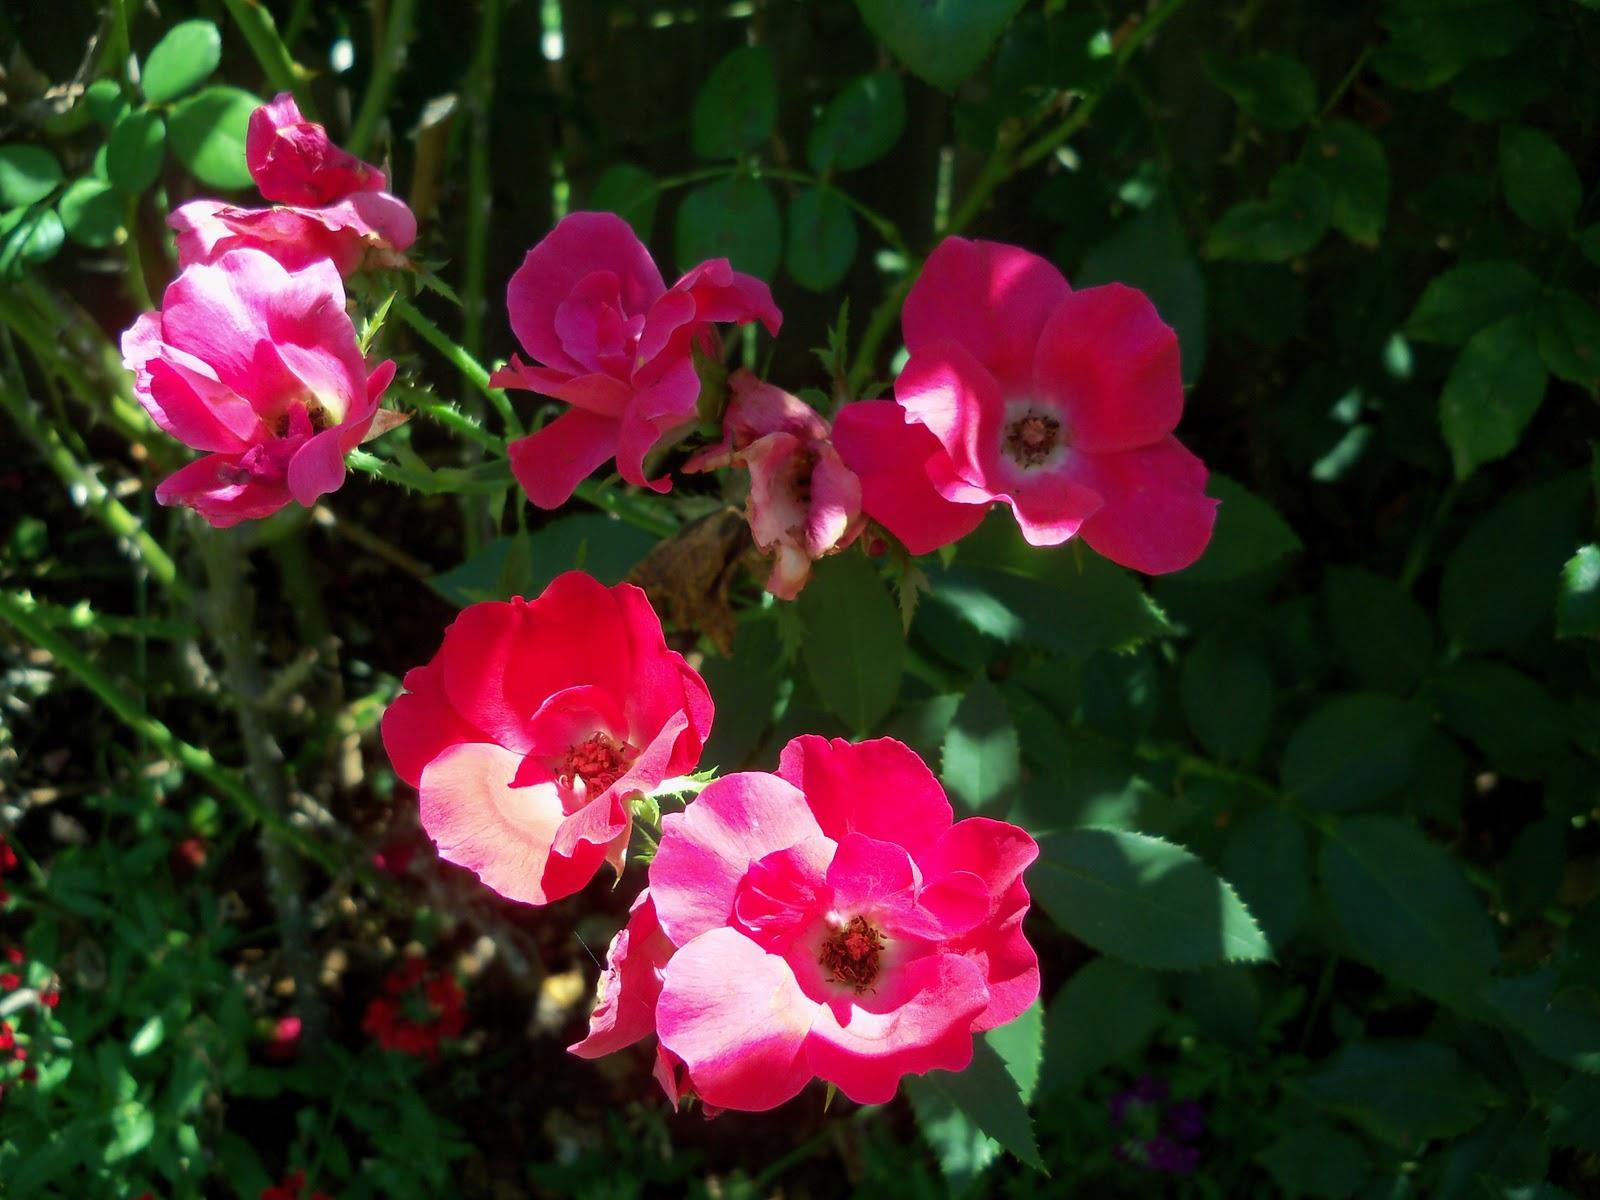 Gardening 2010, Part Three - 101_4459.JPG